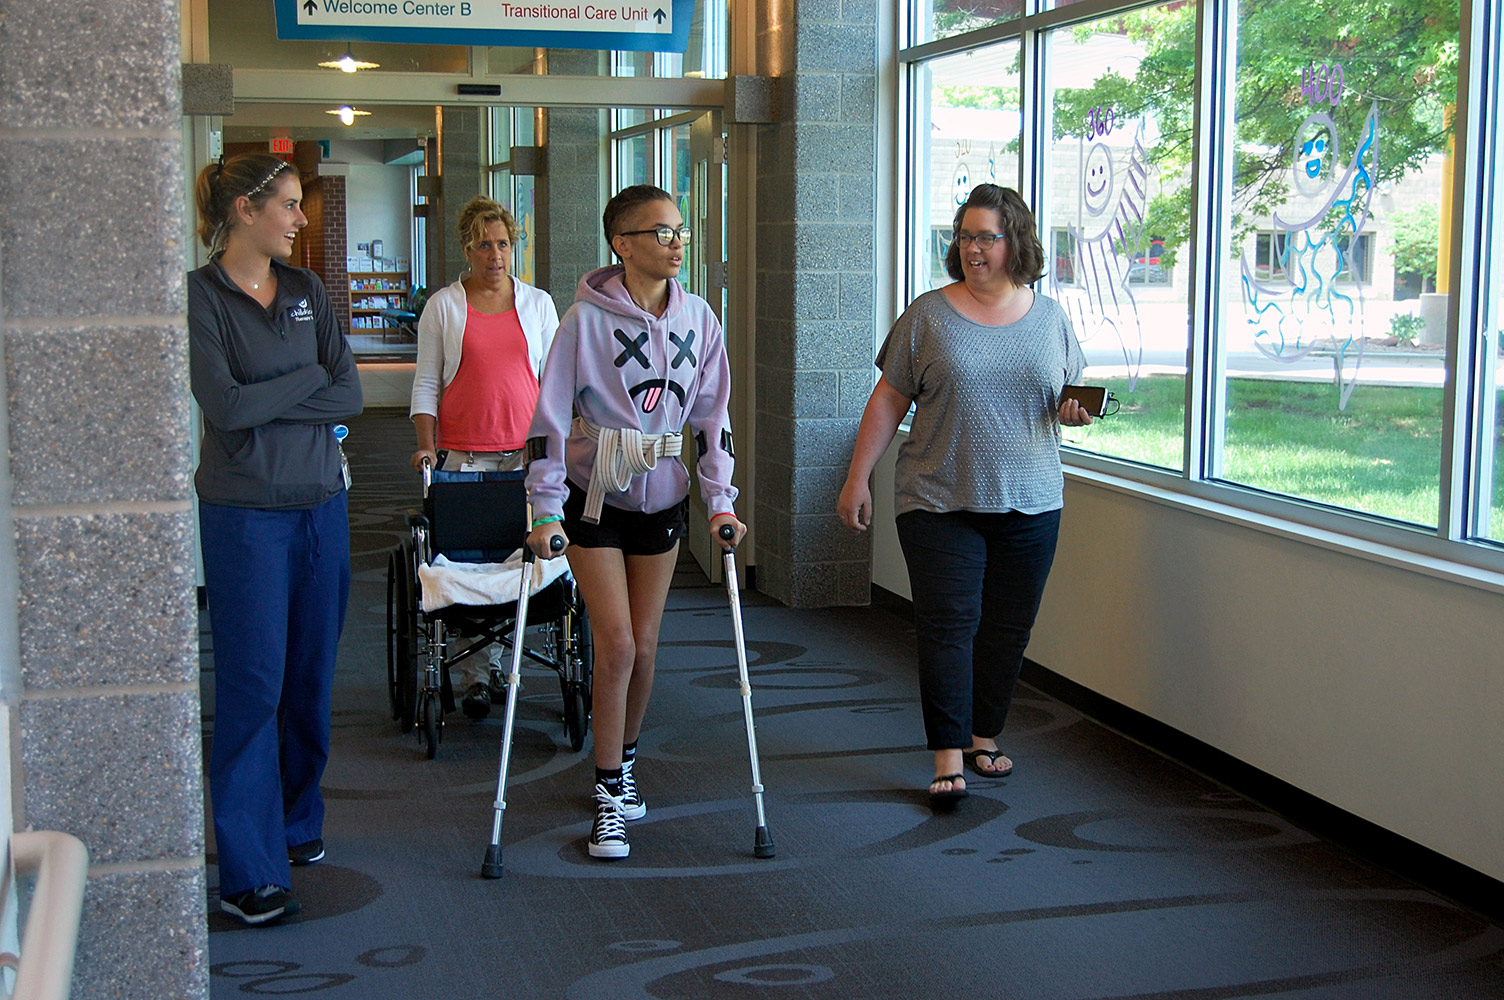 Sarah walking down the hallway.